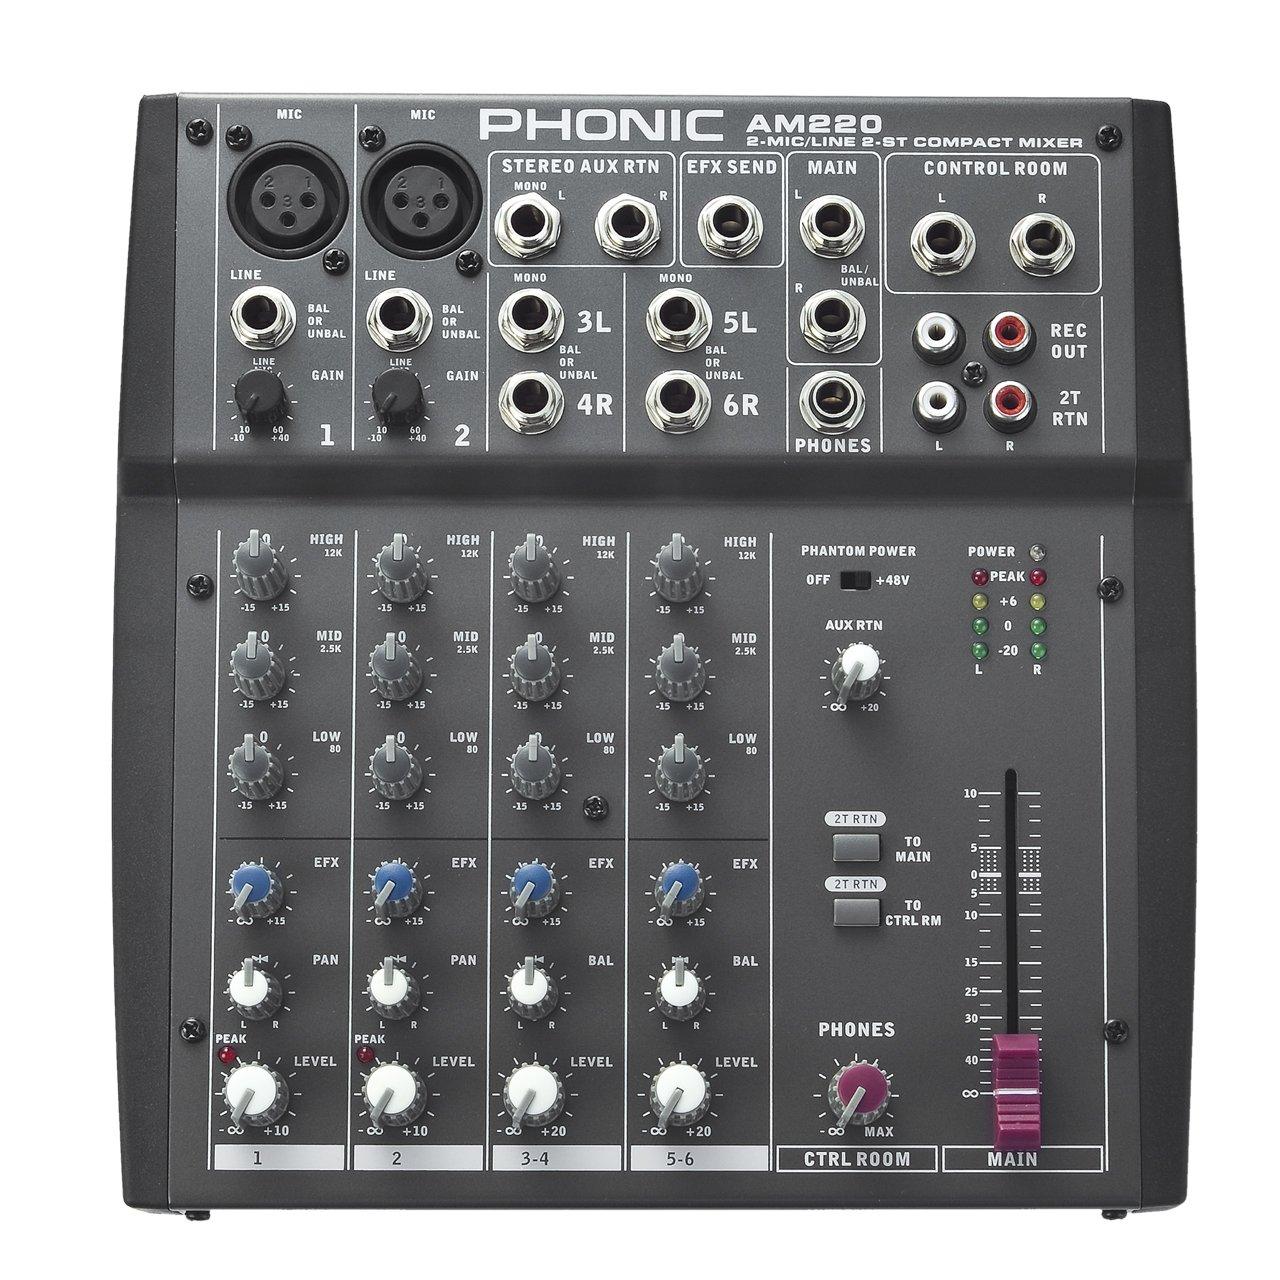 Phonic Mixer - Unpowered (AM220)